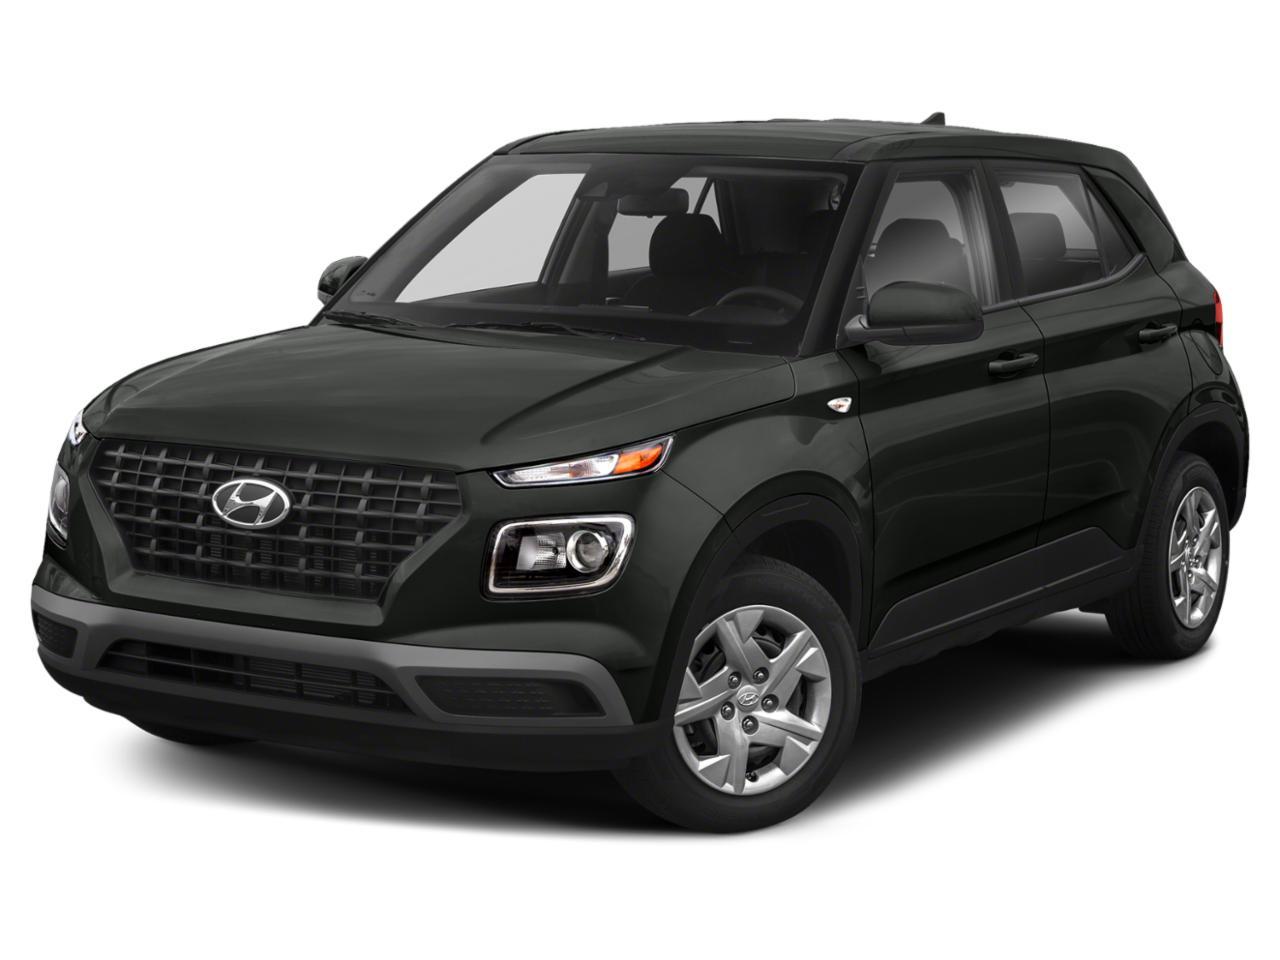 2021 Hyundai Venue Vehicle Photo in Owensboro, KY 42303